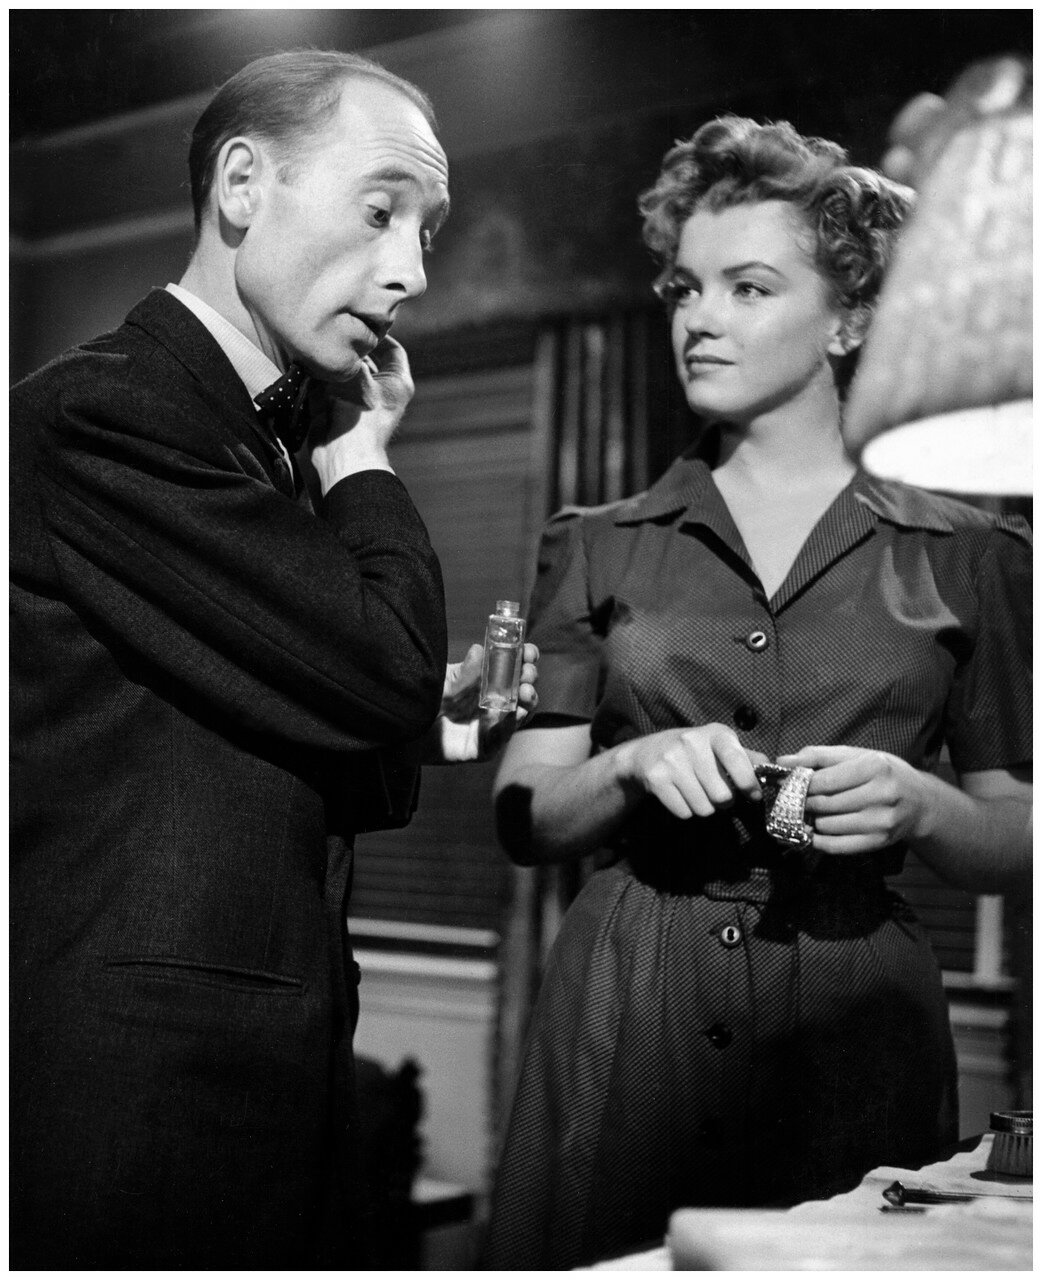 1952. Рой Уорд Бейкер и Мэрилин Монро на съемках «Можно входить без стука»